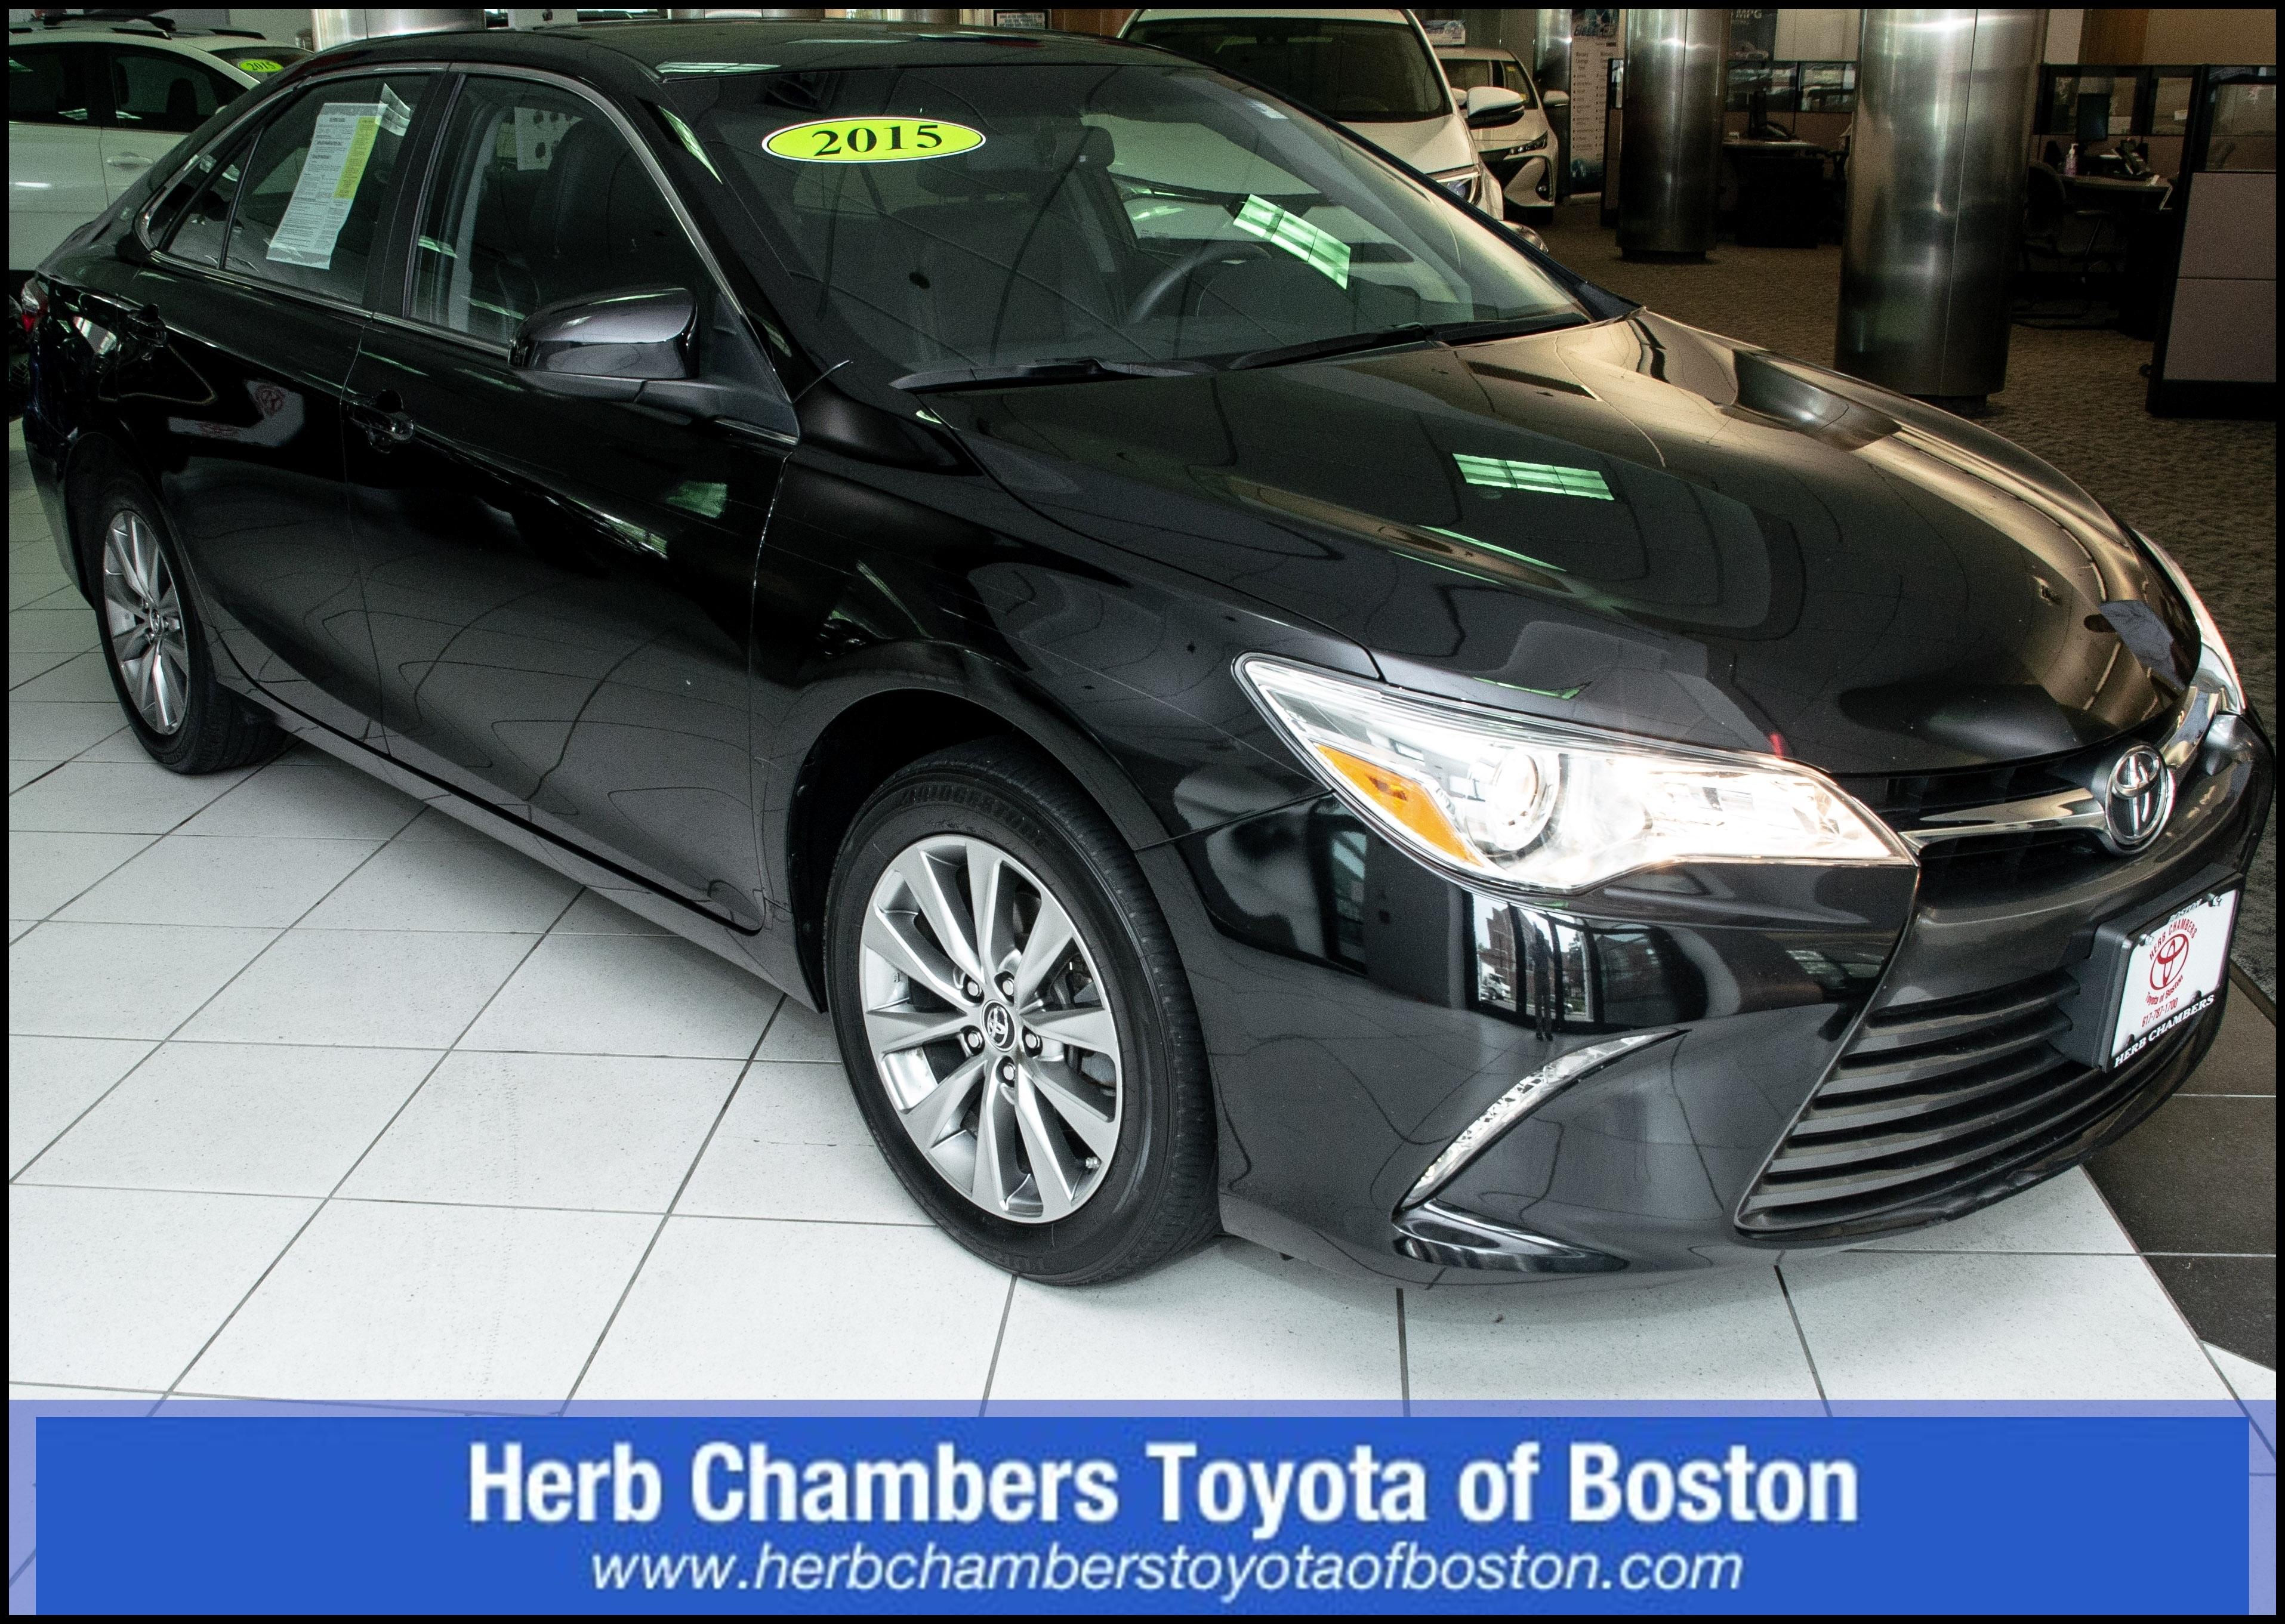 Used 2015 Toyota Camry For Sale in Boston MA Near Cambridge Newton & Quincy MA